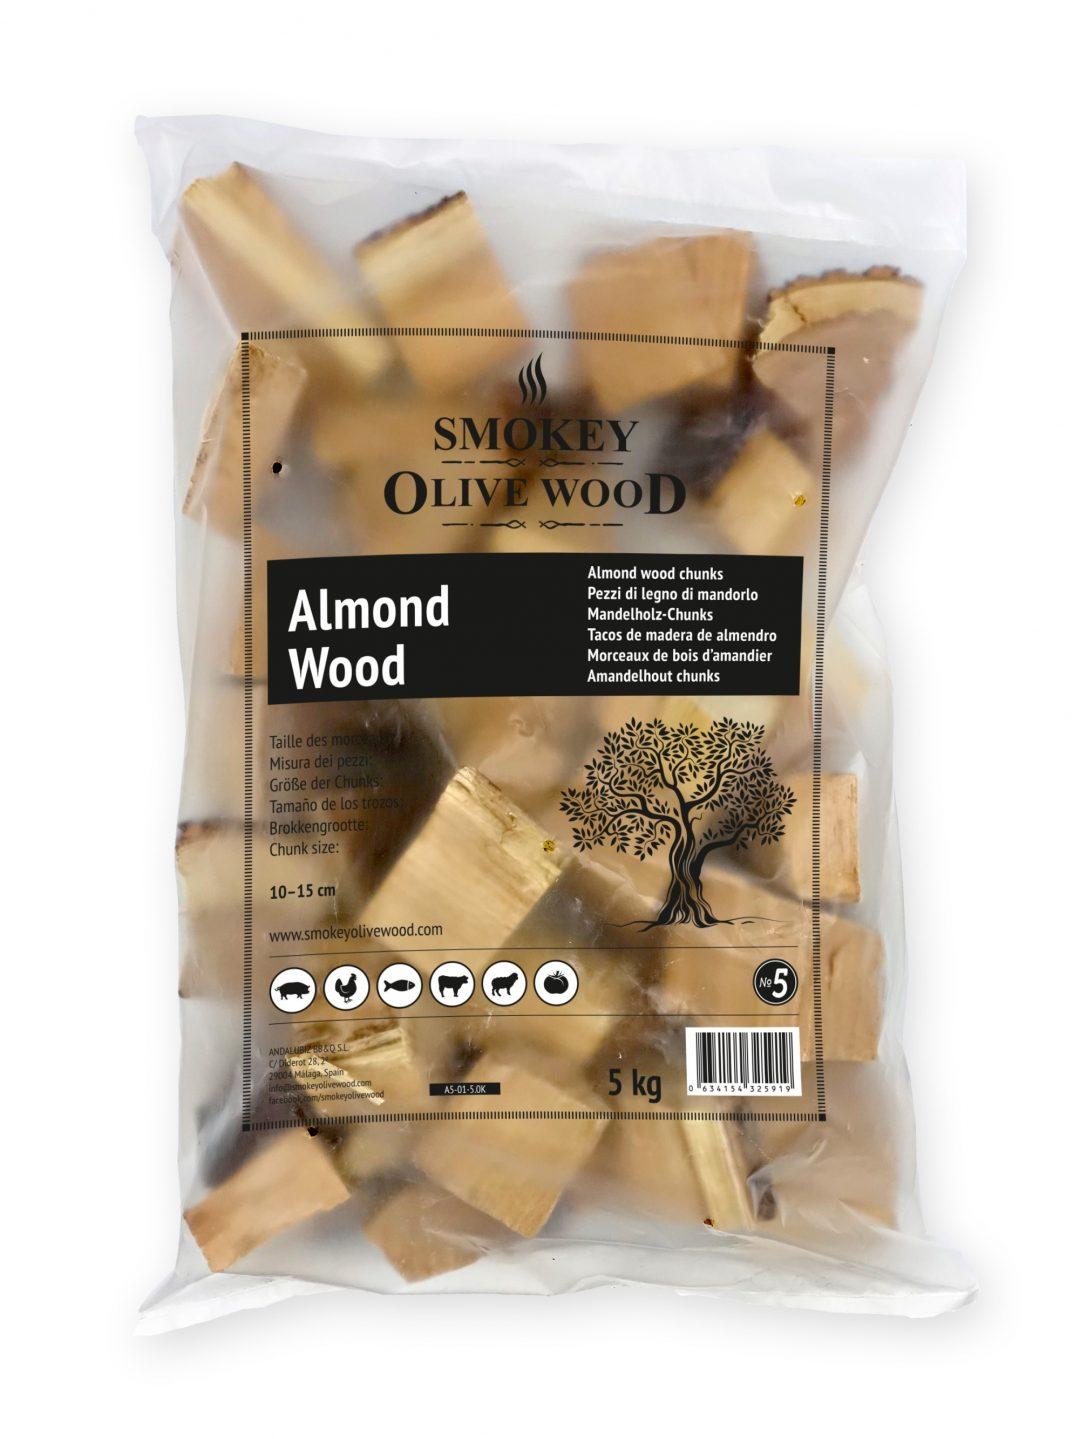 SOW almond wood chunks